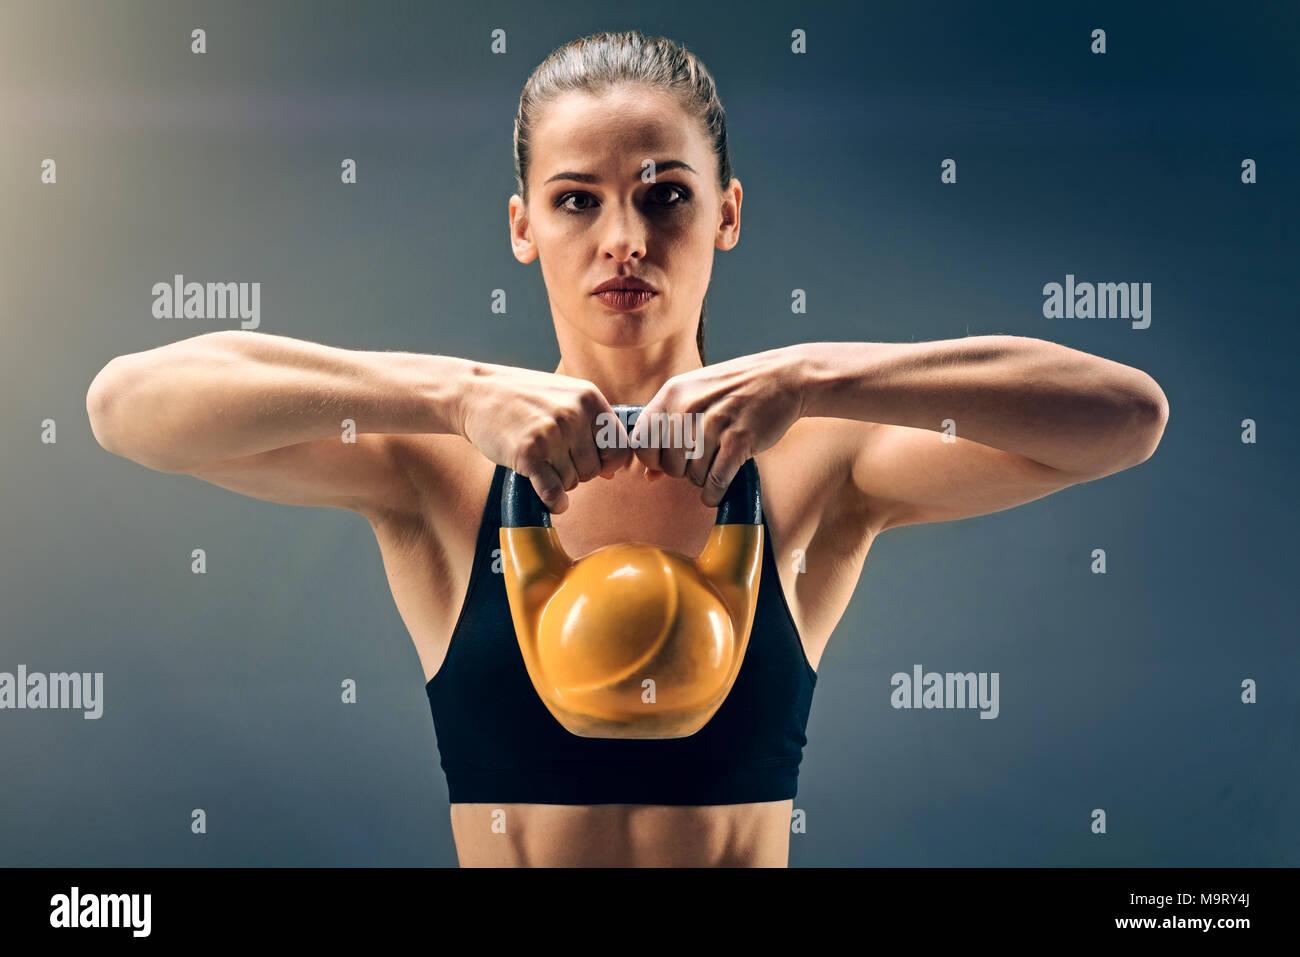 Strong muscular sportswoman holding heavy kettlebell - Stock Image